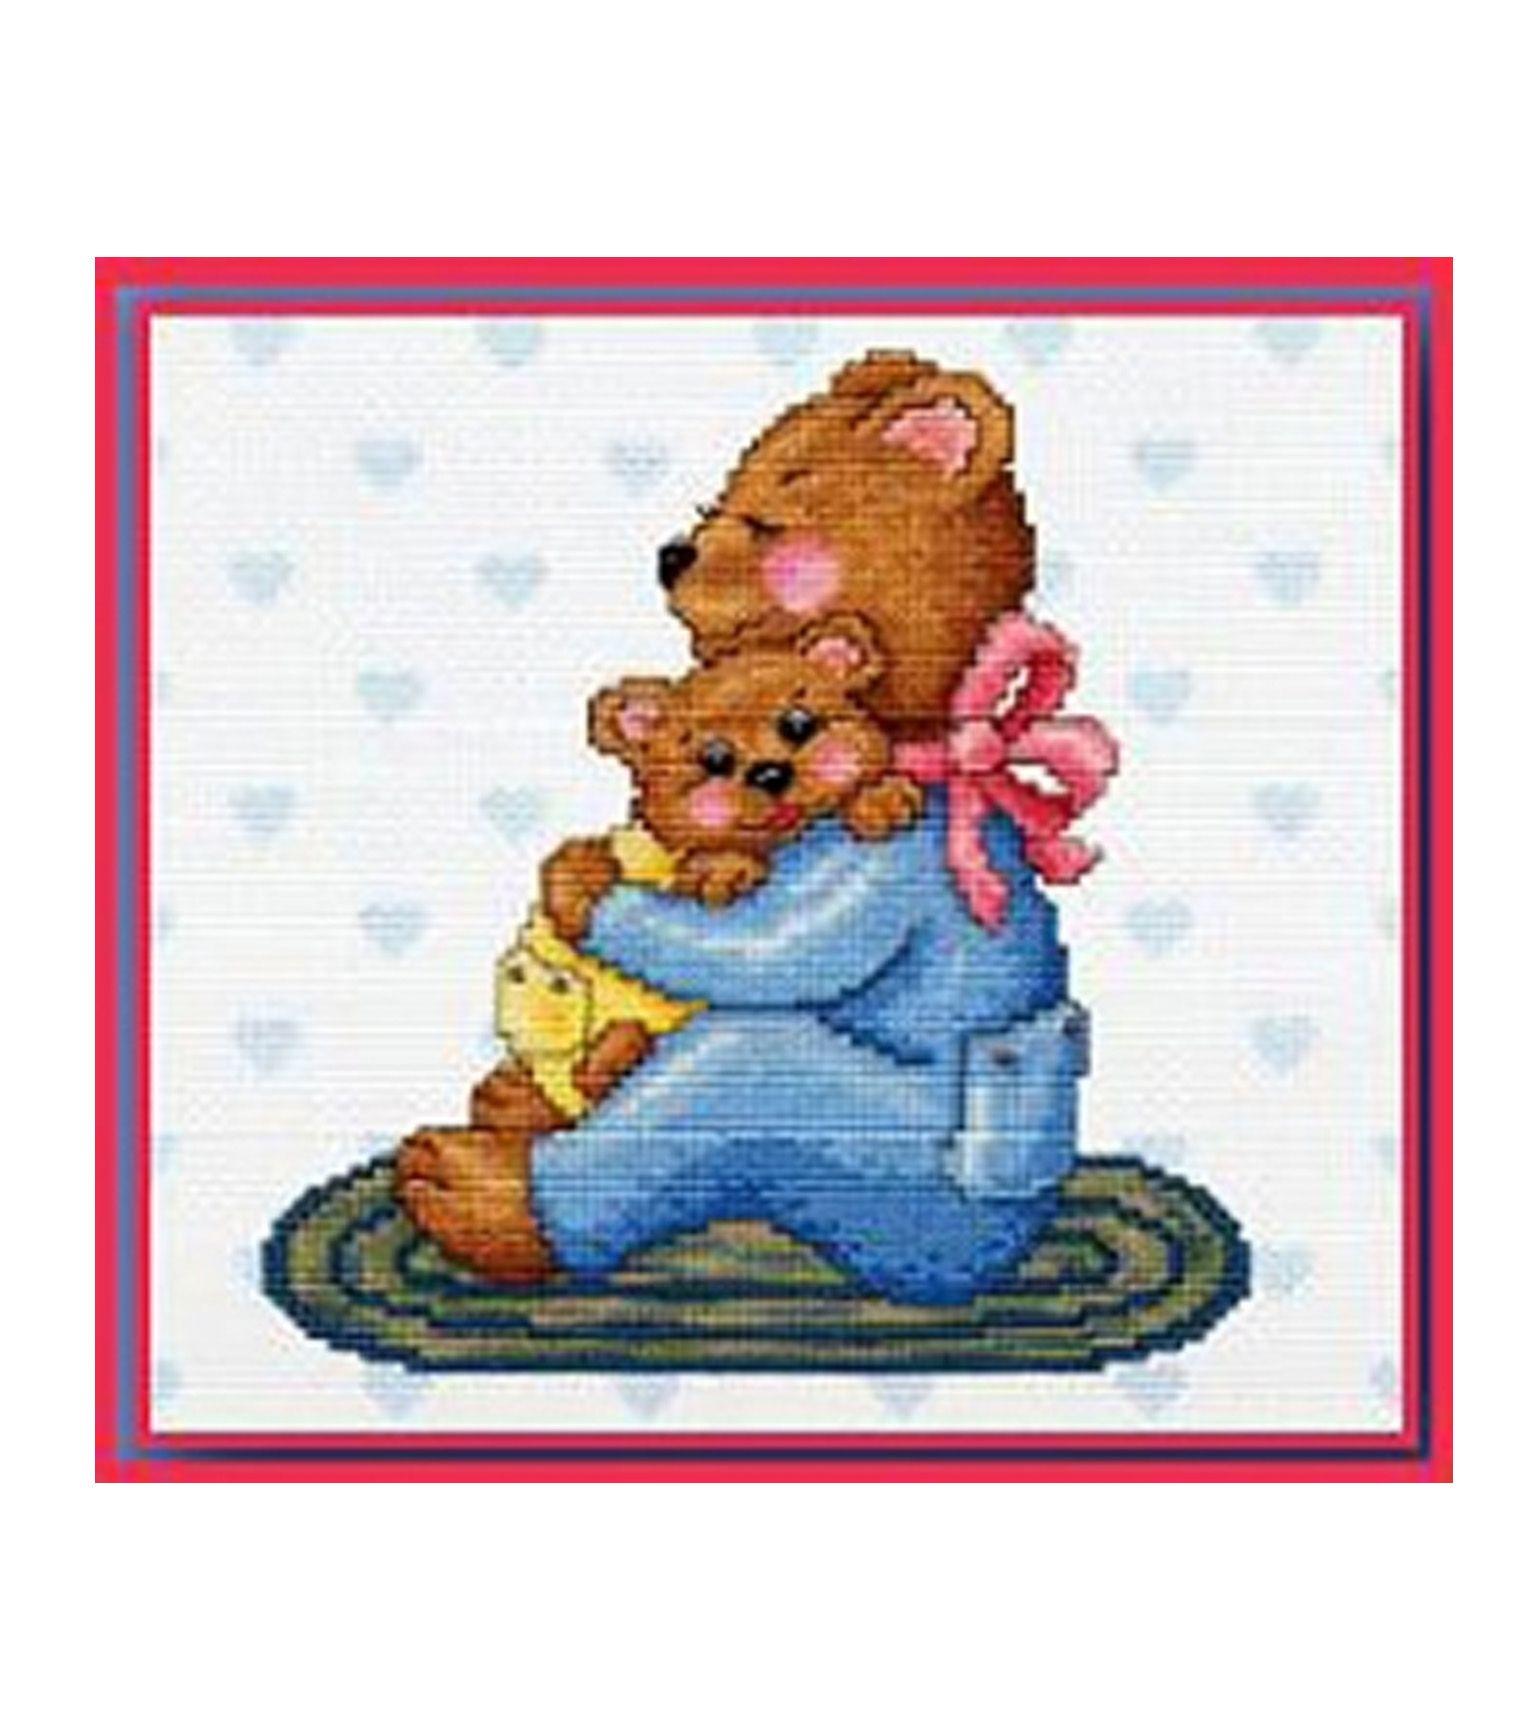 Free cross stitch design using DMC Impressions Aida: http://dmc-usa.com/Inspiration/Projects/Cotton-Floss-Cross-Stitching/Loving-Bear.aspx